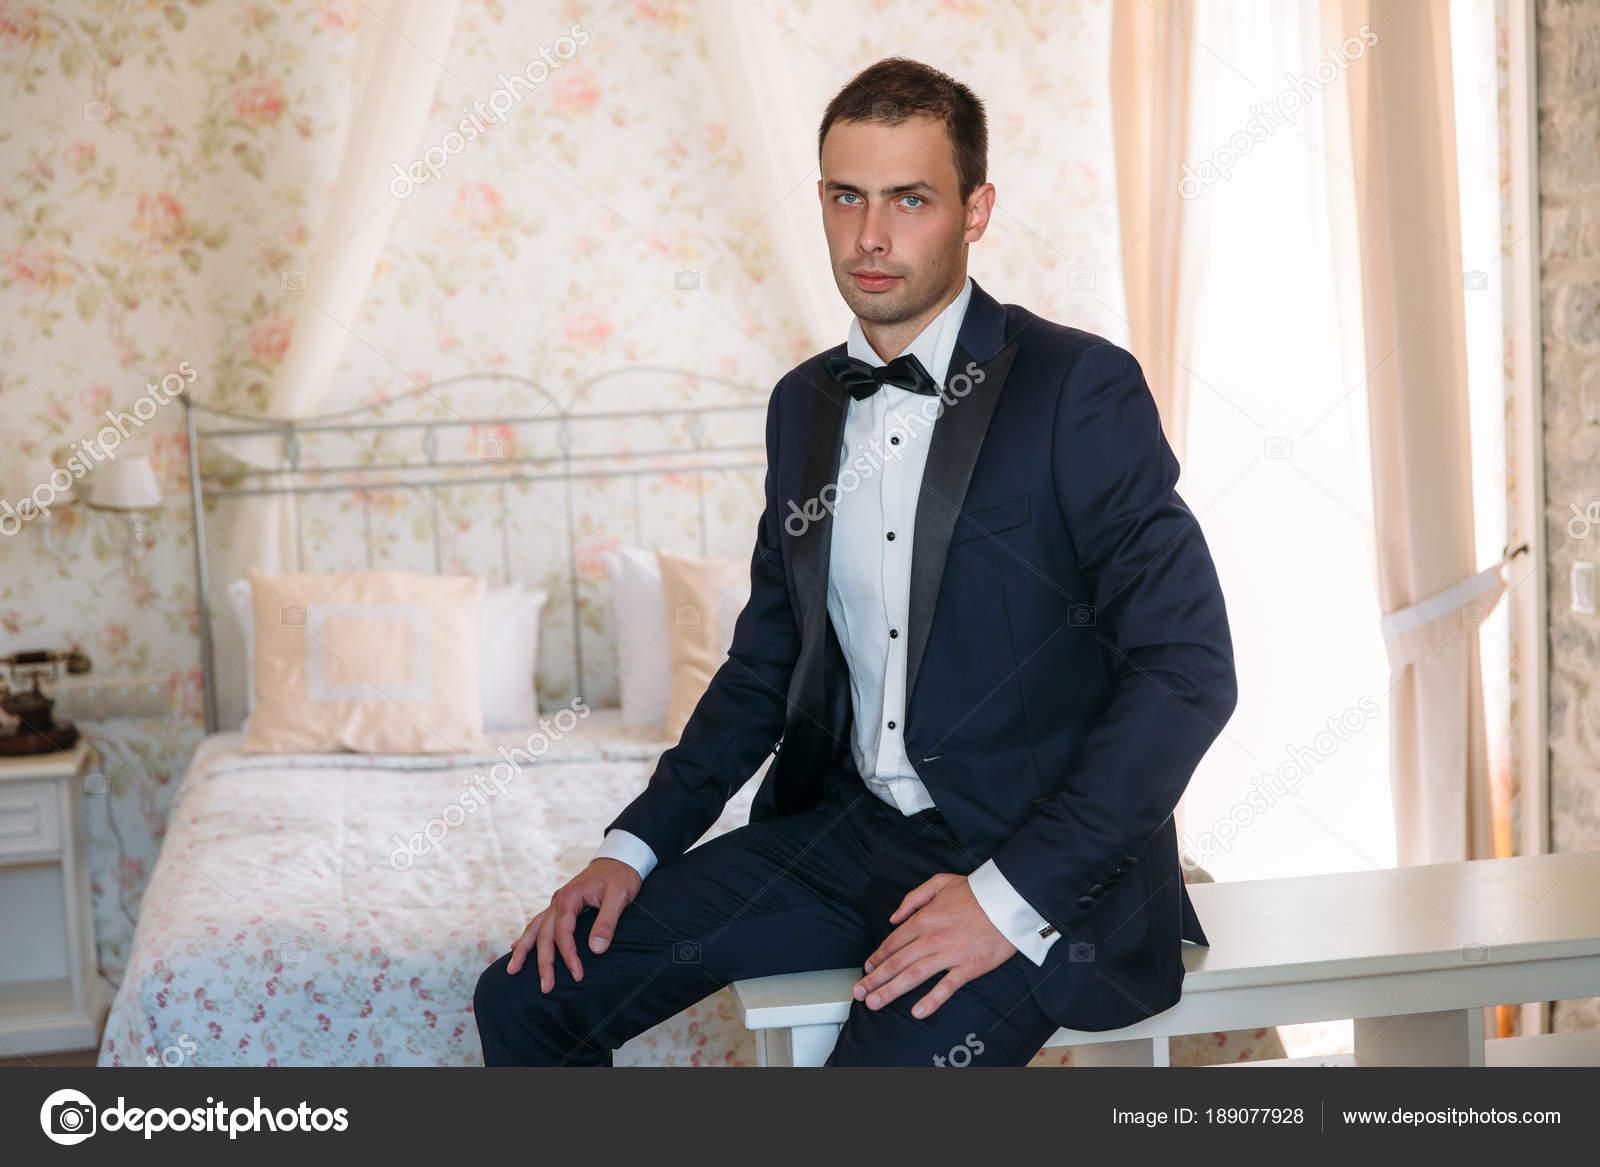 a44b361f83cf ... ένα αυστηρό κοστούμι με ένα άσπρο πουκάμισο και ένα παπιγιόν με το πρωί  φορέματα για την ημέρα του γάμου. Επιχειρηματίας στα κλασικά ρούχα — Εικόνα  από ...